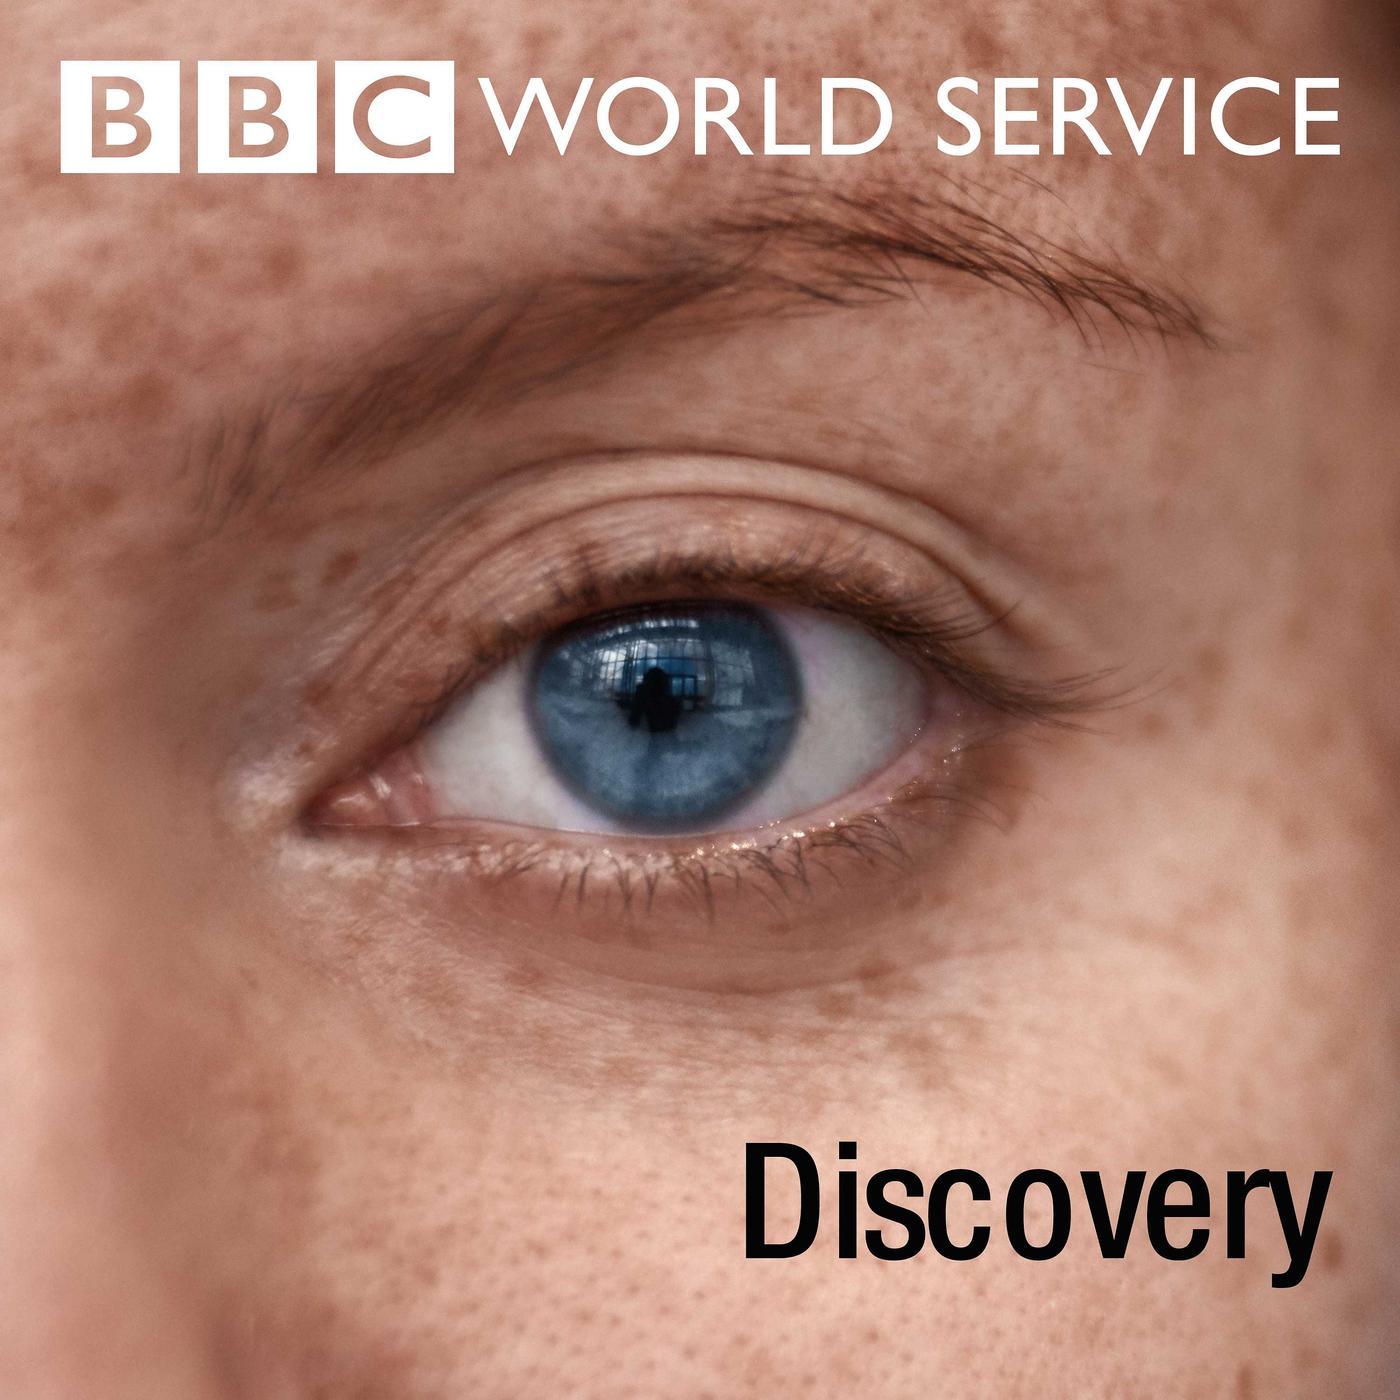 Discovery (podcast) - BBC World Service